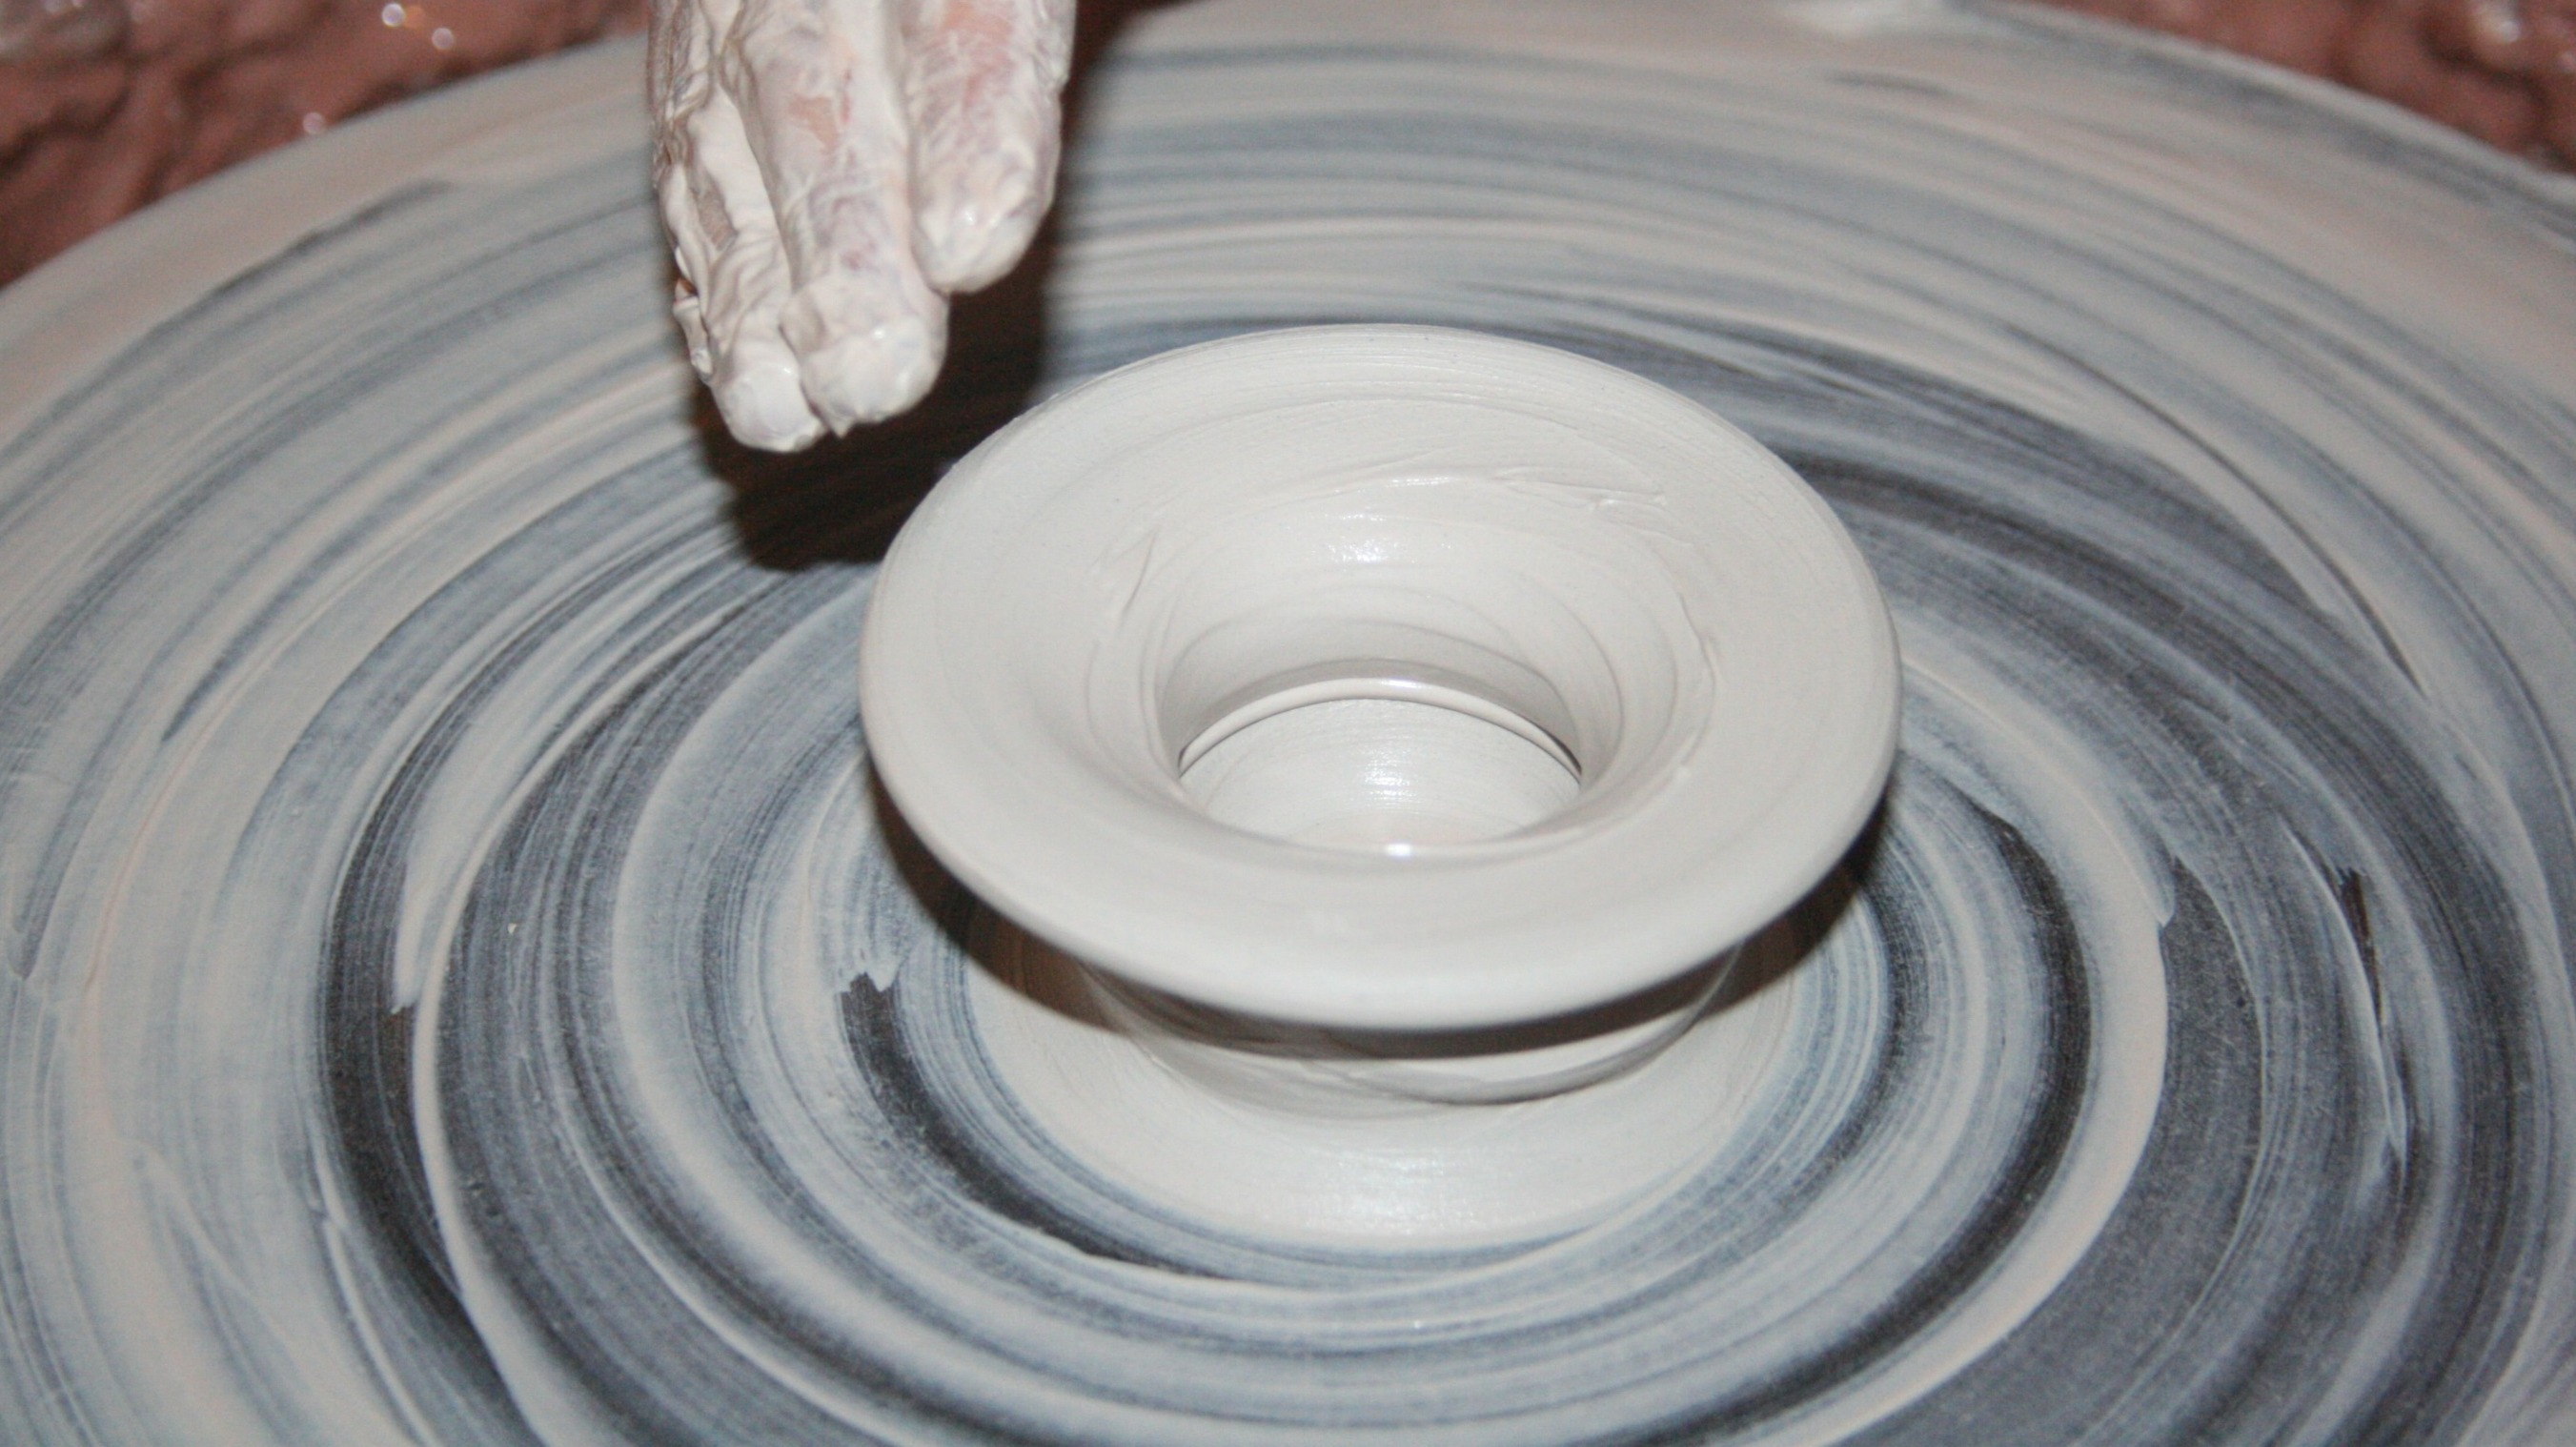 https://www.pexels.com/photo/person-making-clay-pot-162574/